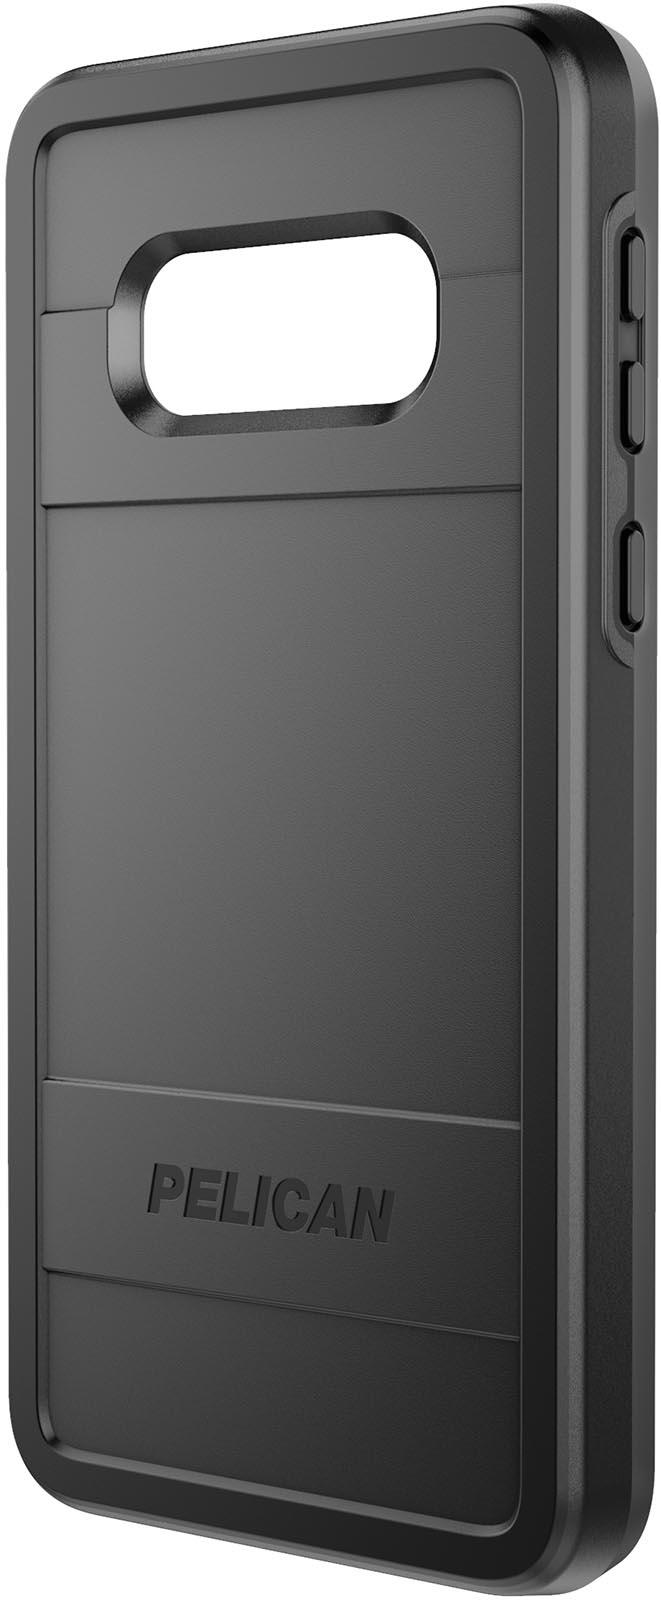 pelican samsung galaxy s10e slim phone case